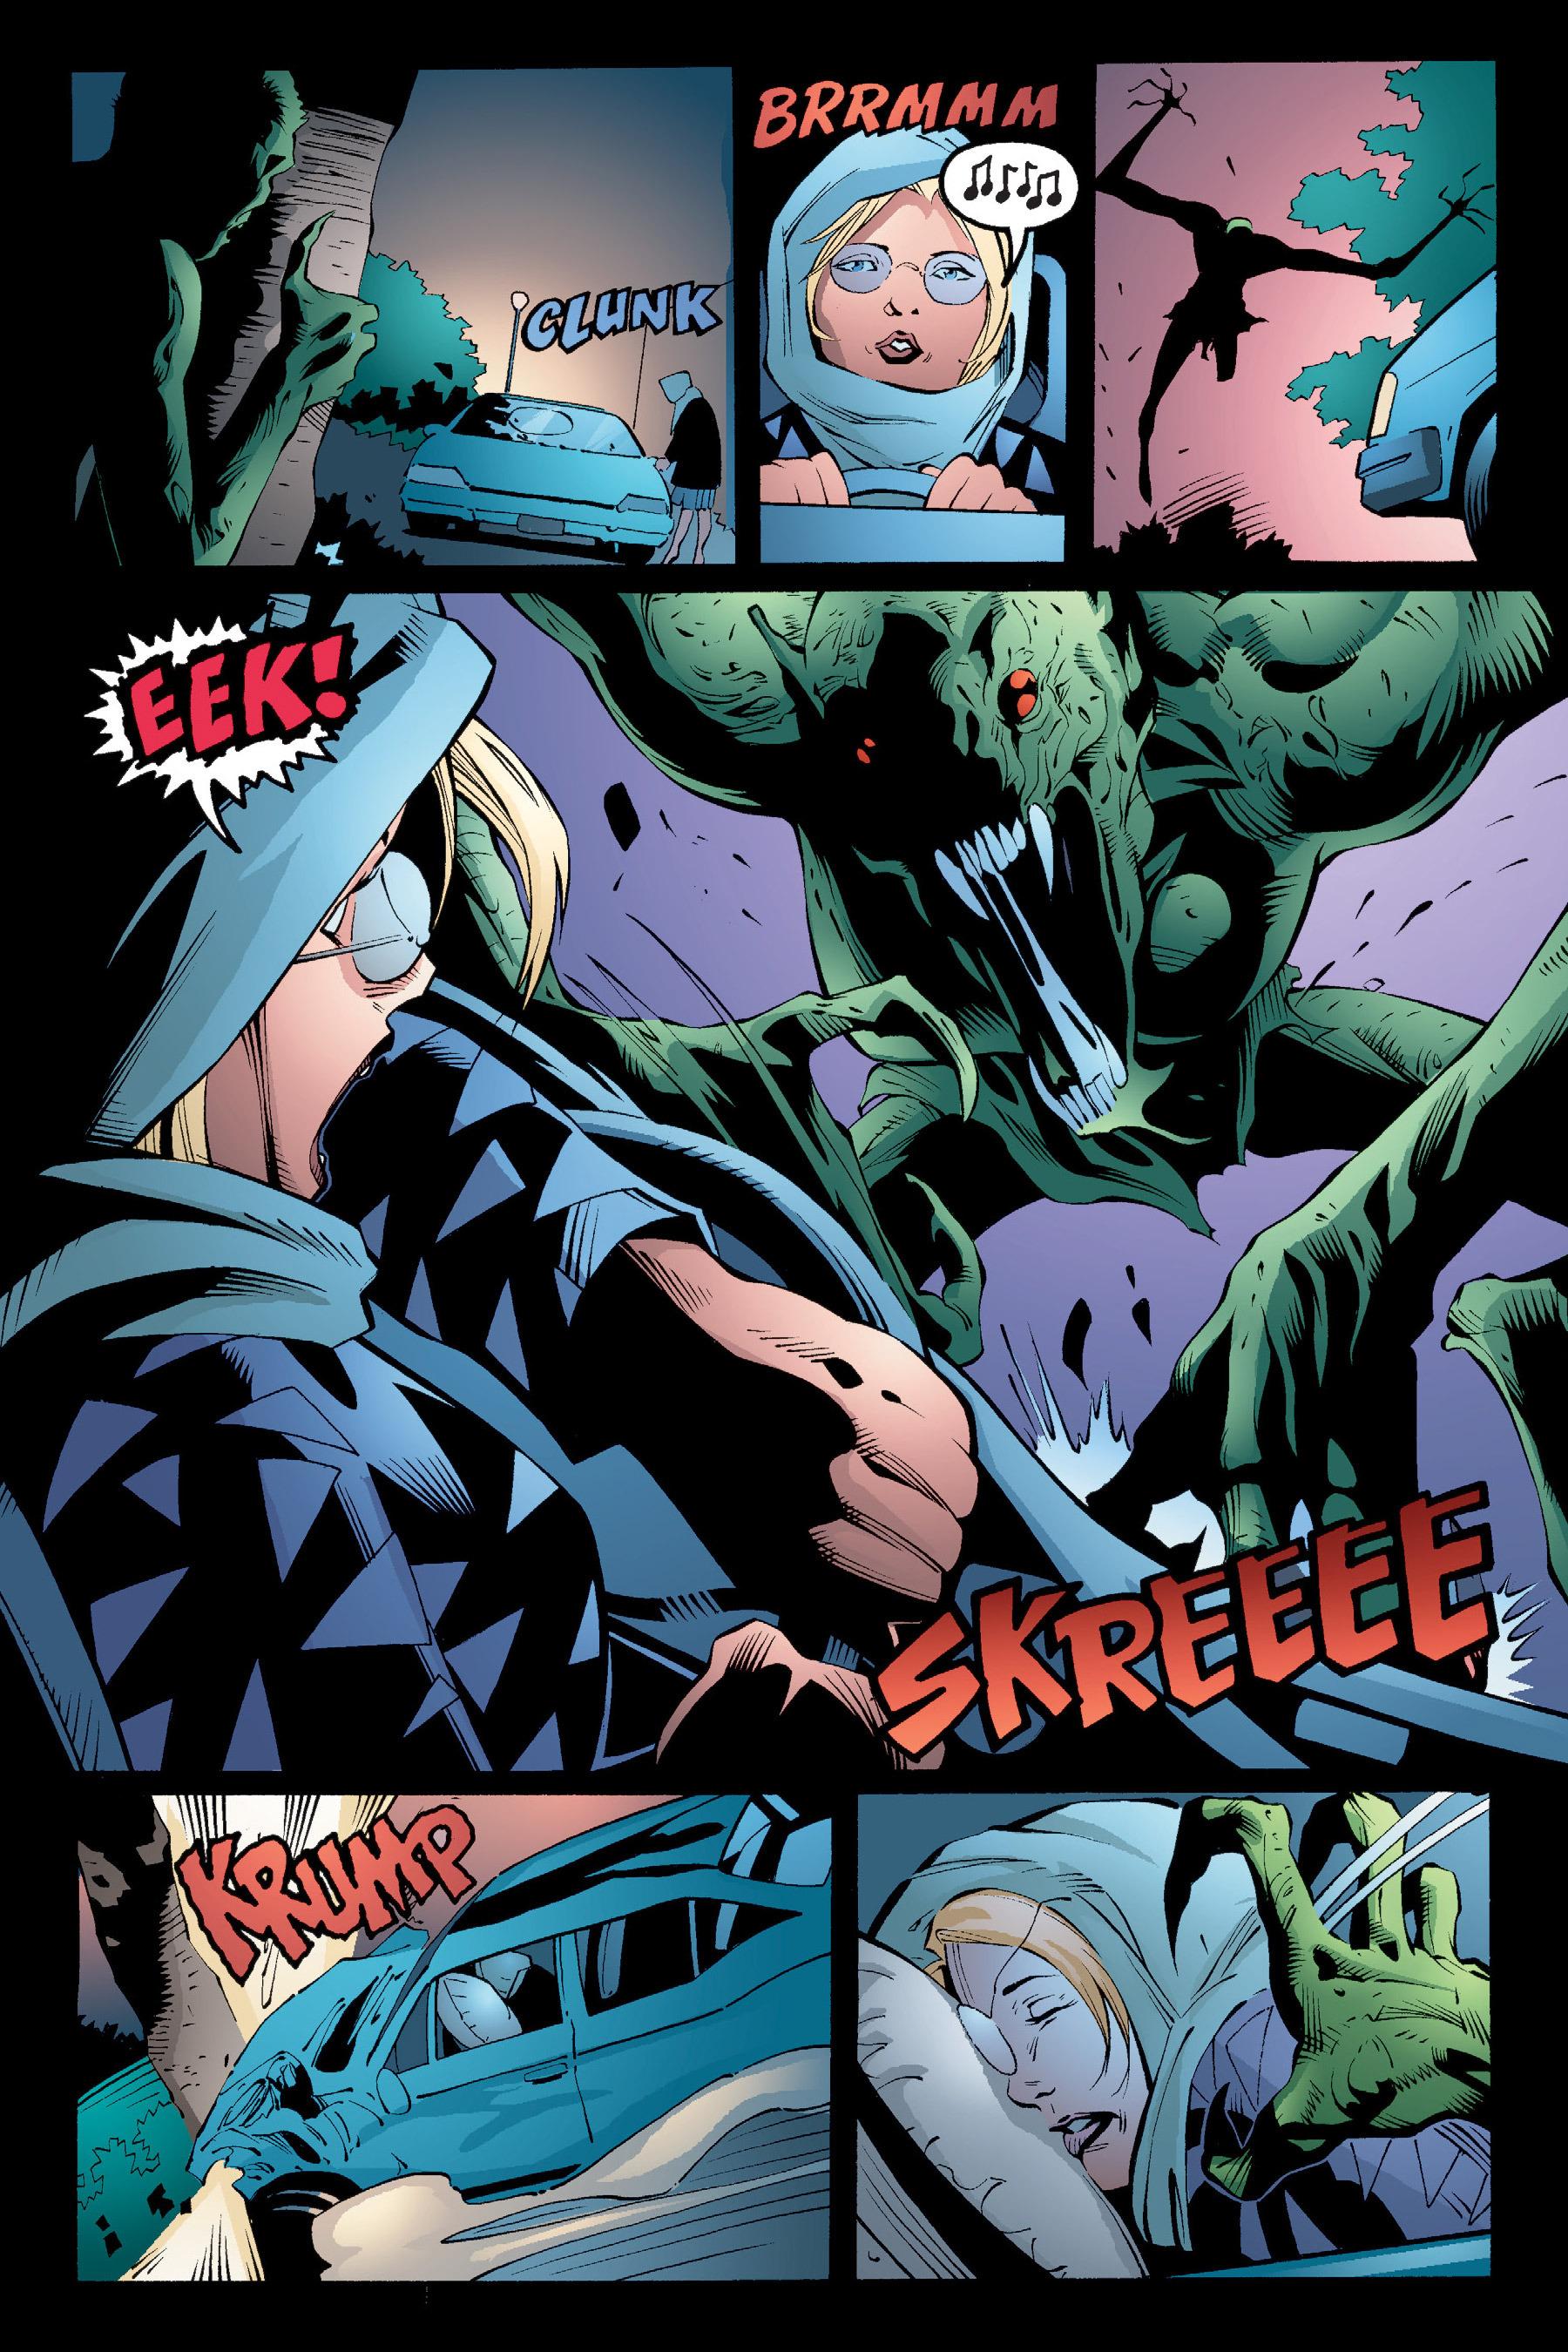 Read online Buffy the Vampire Slayer: Omnibus comic -  Issue # TPB 4 - 19